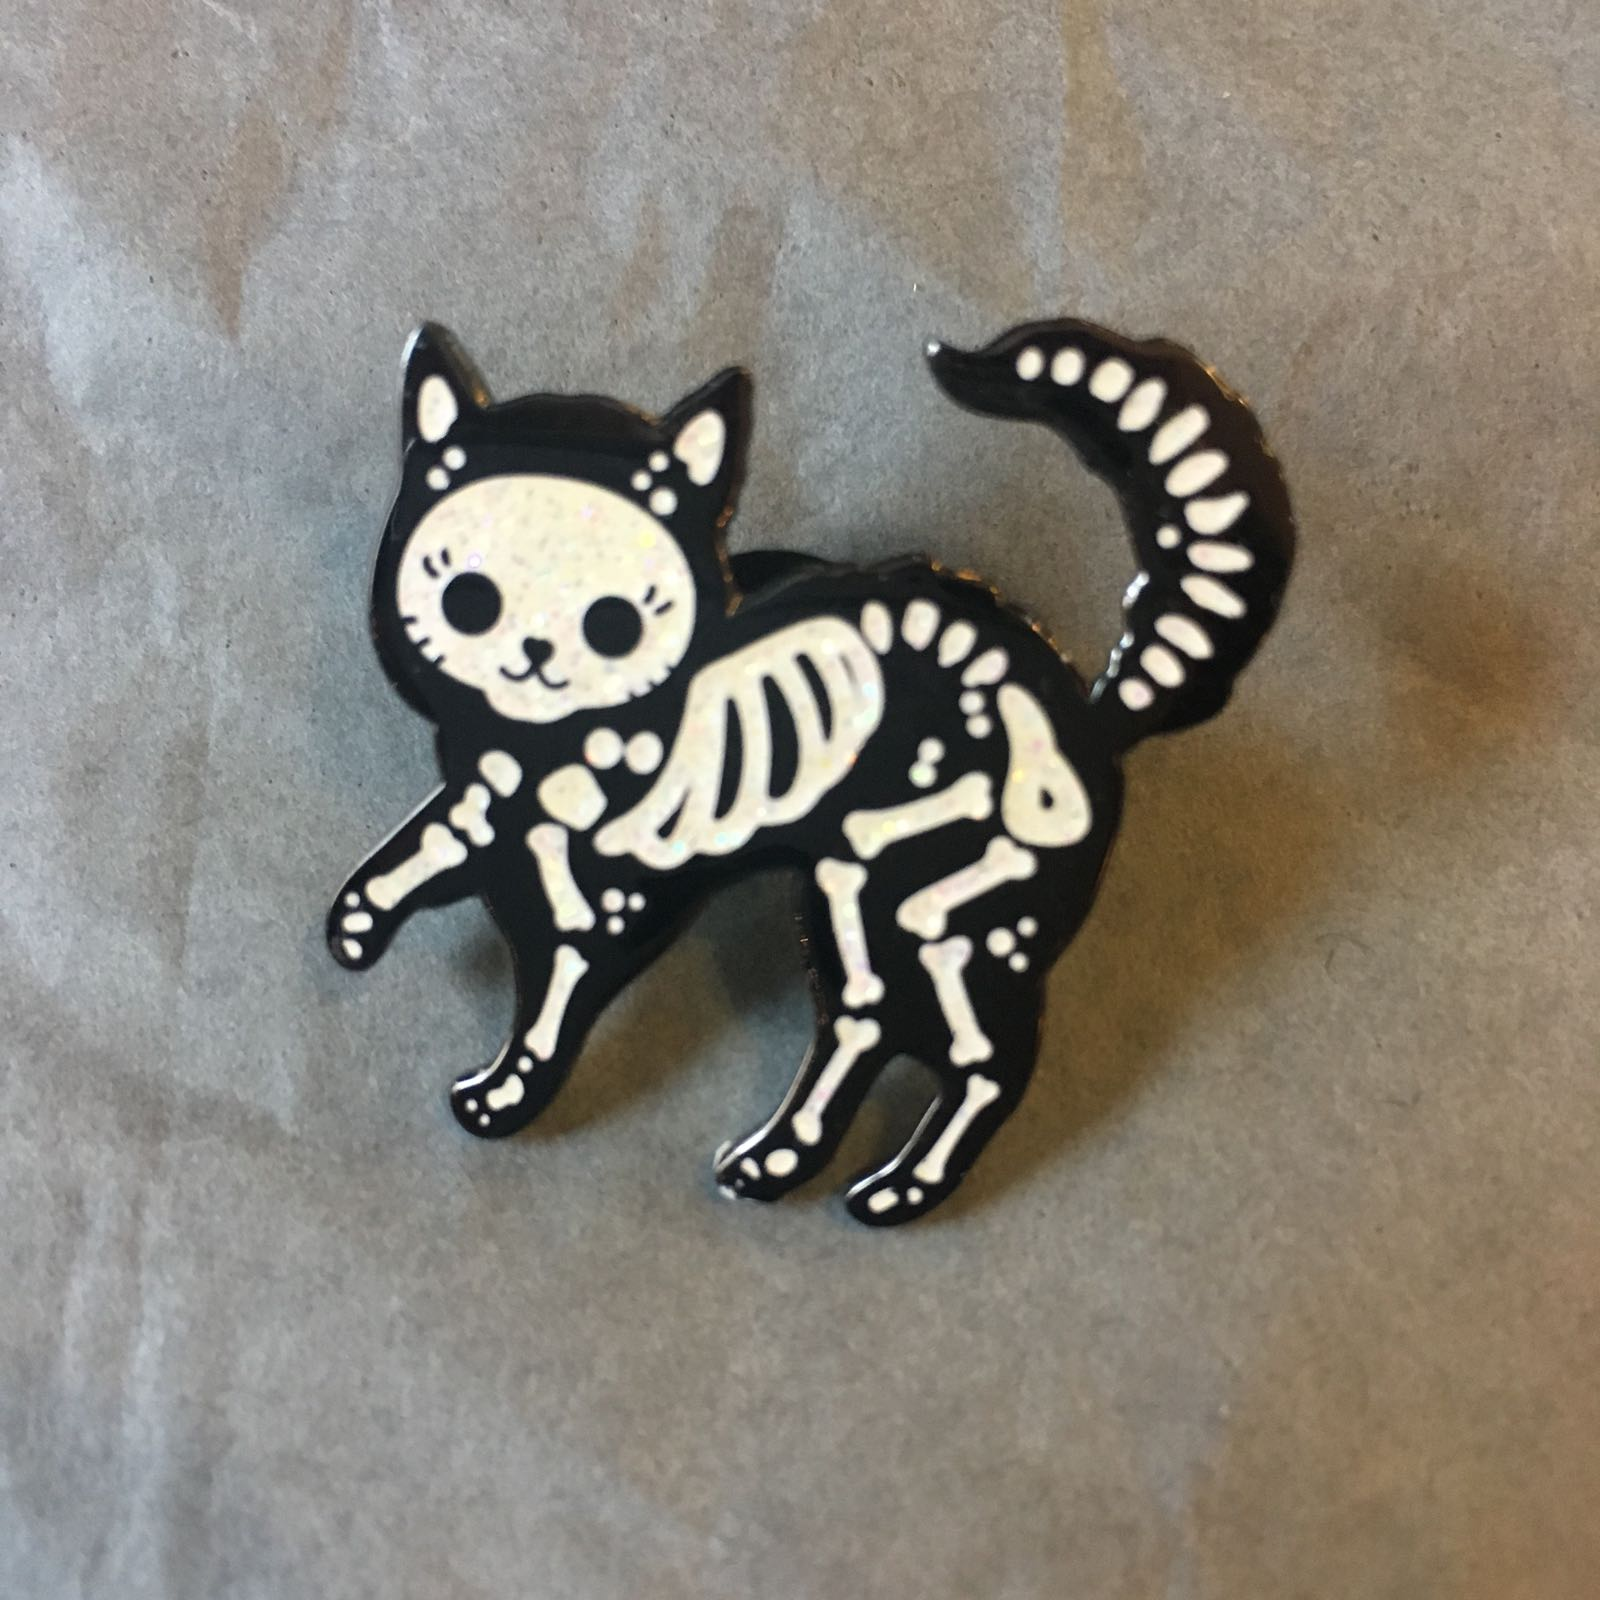 Pin Badge - Skeleton Cat Design.